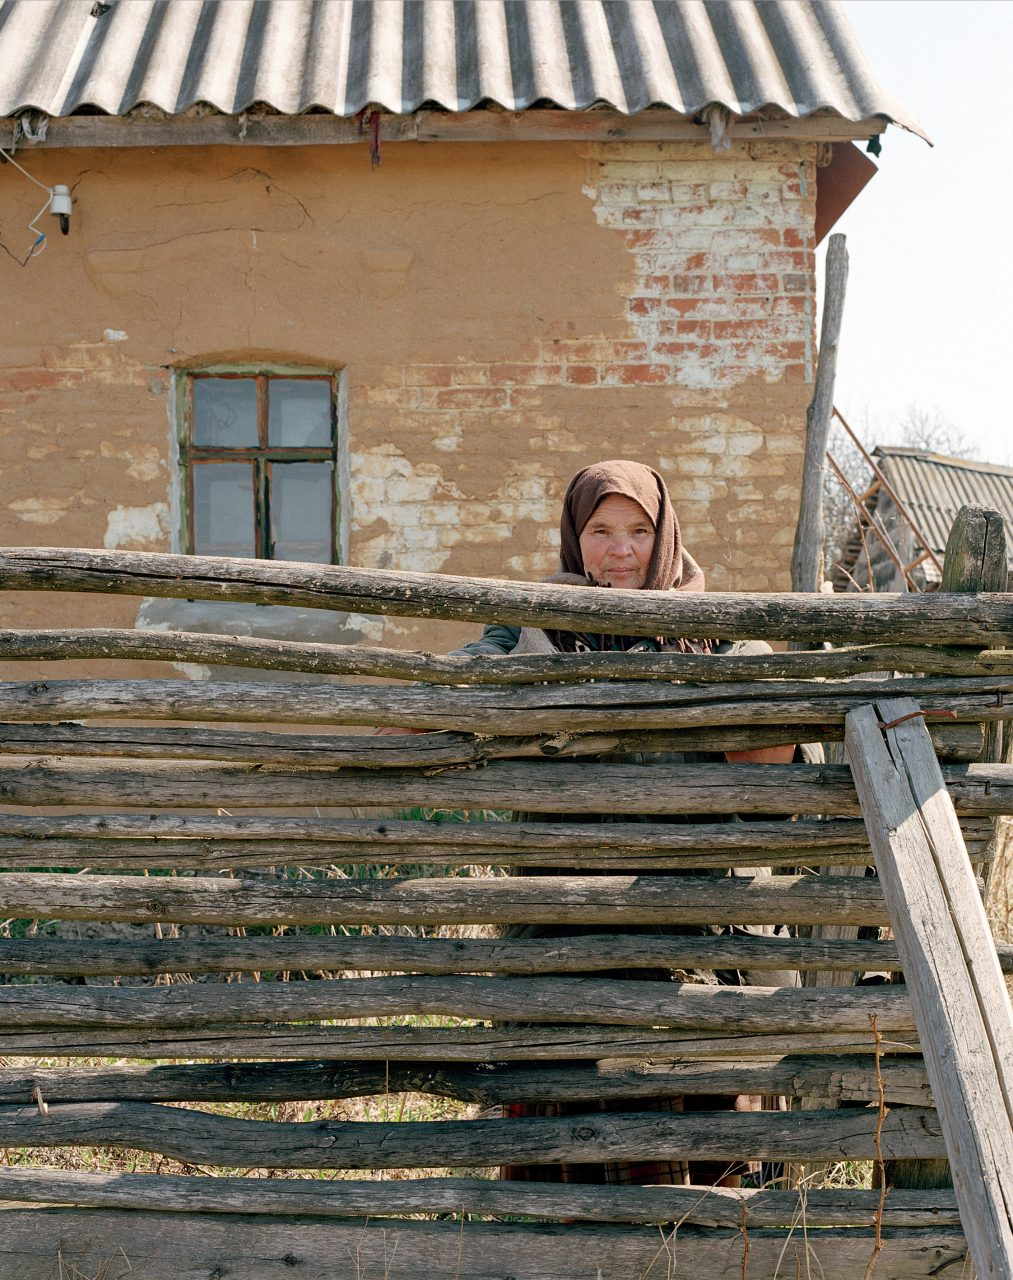 Bezhin Lug (Bezhin Meadow), Tatyana Mikhailovna, c-print on dibond, 100x80, 2004